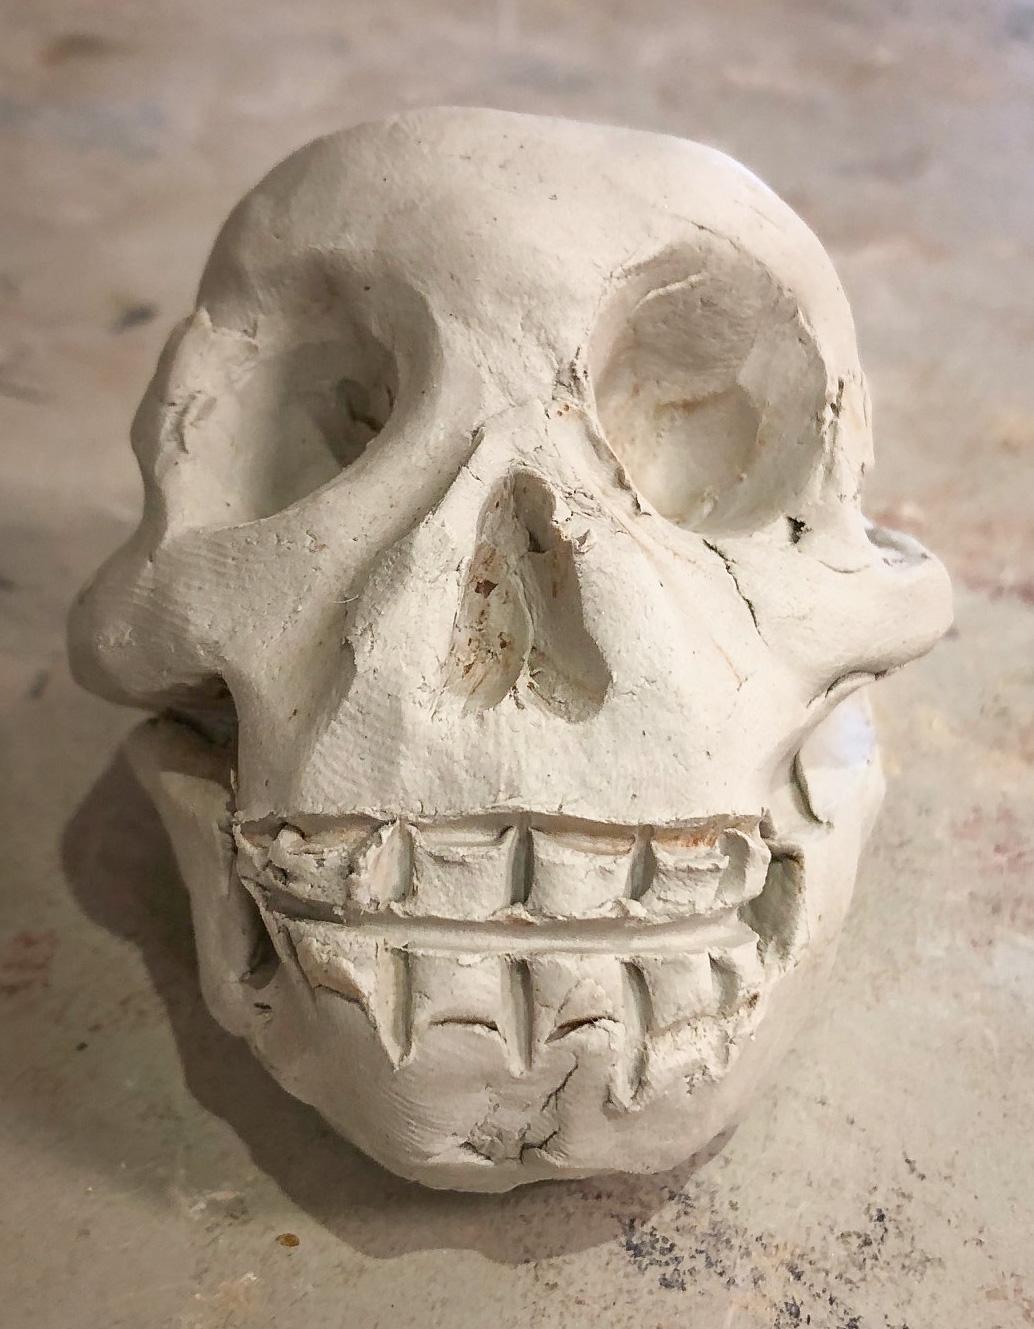 Class Artwork – Handbuilding in Clay: The Skull